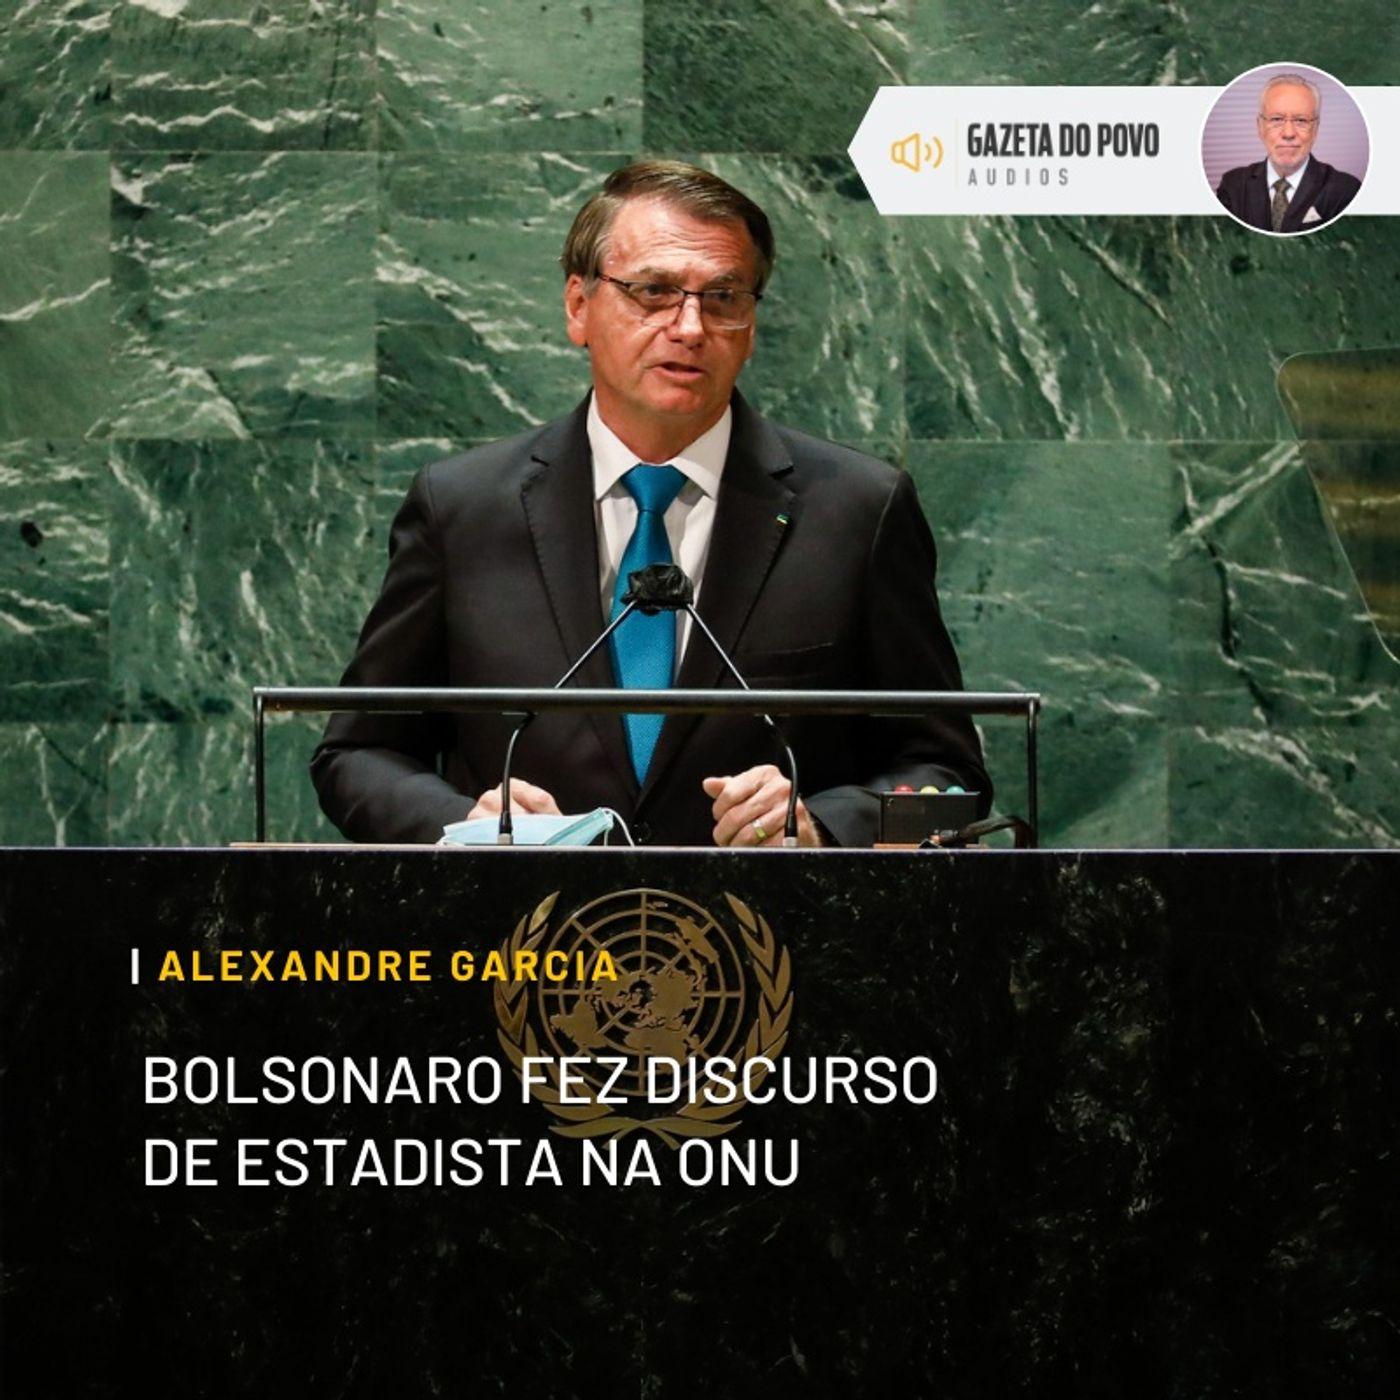 Bolsonaro fez discurso de estadista na ONU